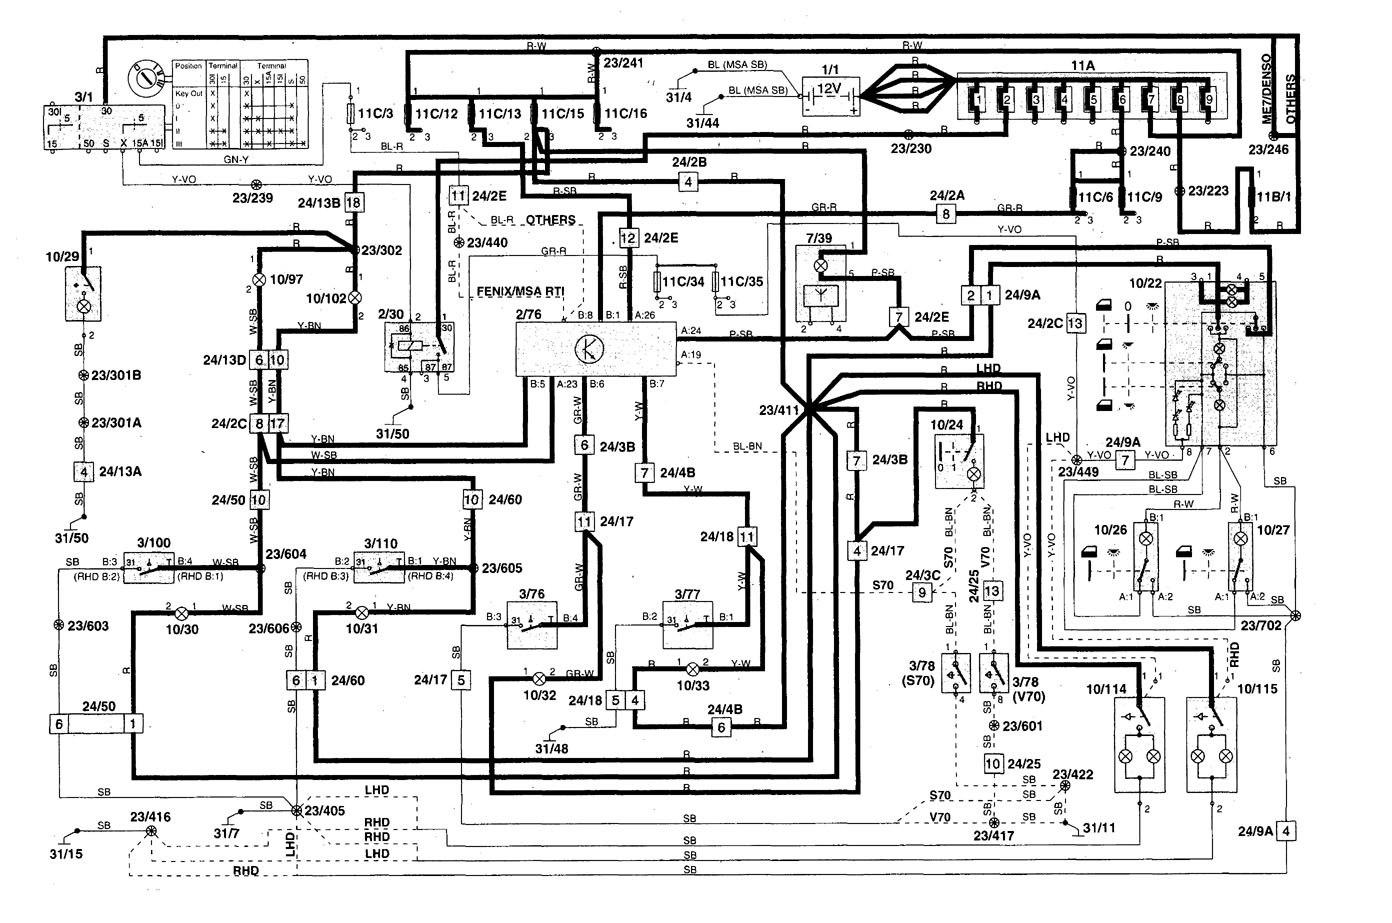 Volvo S70 (1998 - 2000) - wiring diagrams - interior lighting -  Carknowledge.info | Volvo S70 Wiring Diagram |  | Carknowledge.info